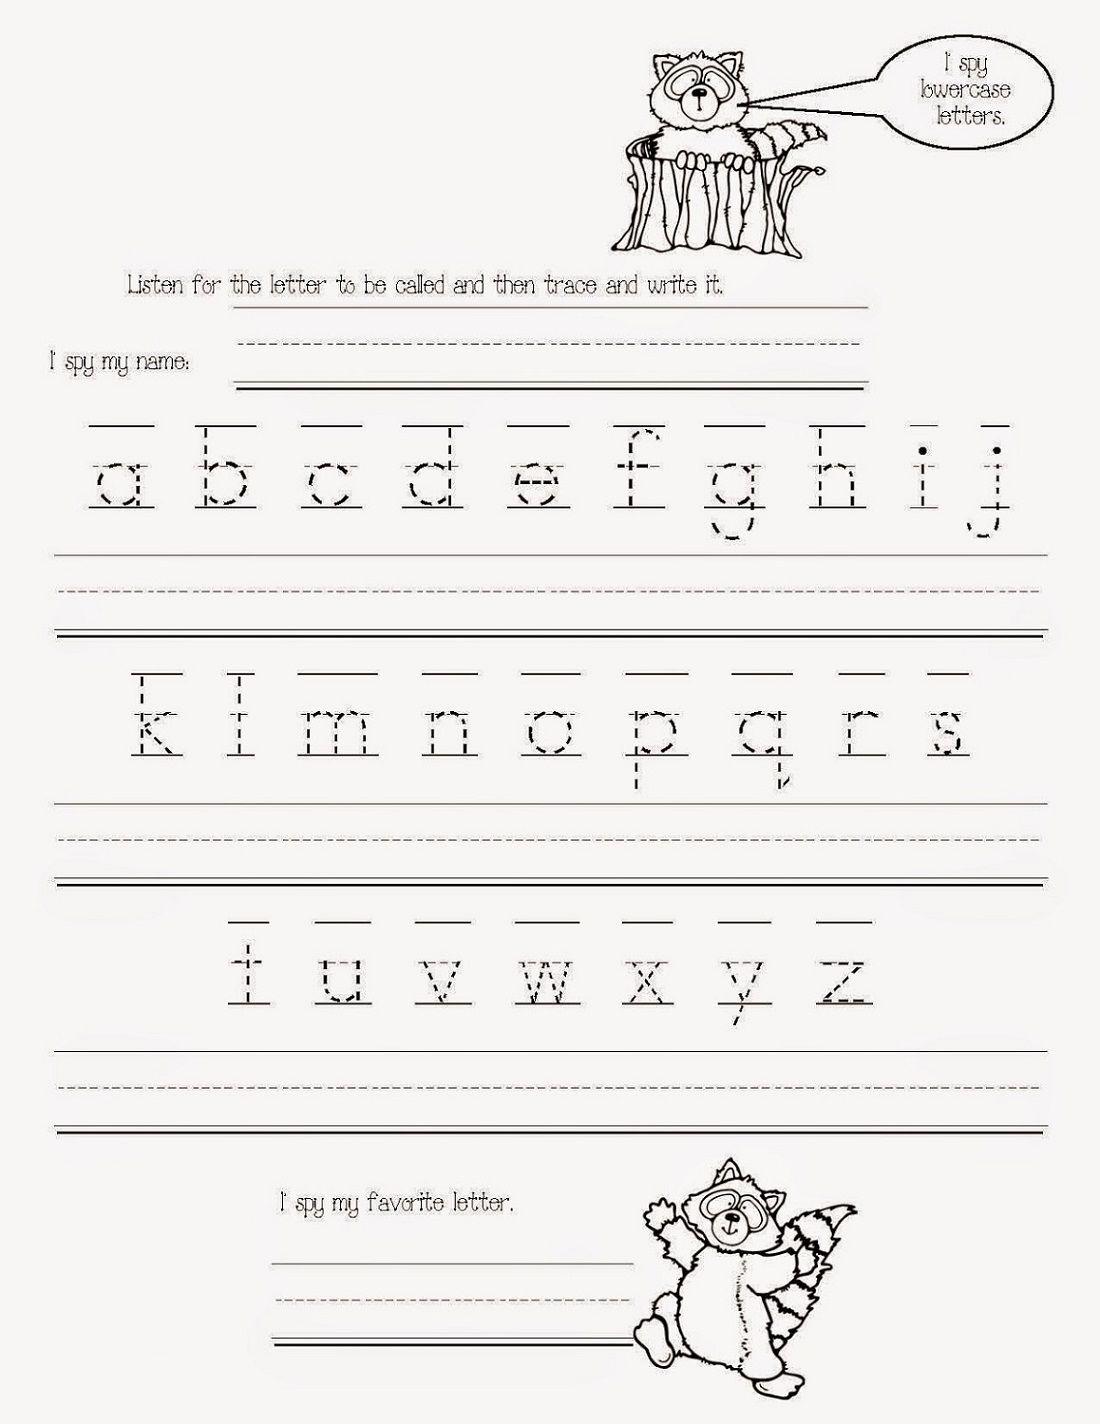 Printable Traceable Alphabet Worksheets A Z Handwriting Worksheets For Kindergarten Free Handwriting Worksheets Word Family Worksheets [ 1424 x 1100 Pixel ]